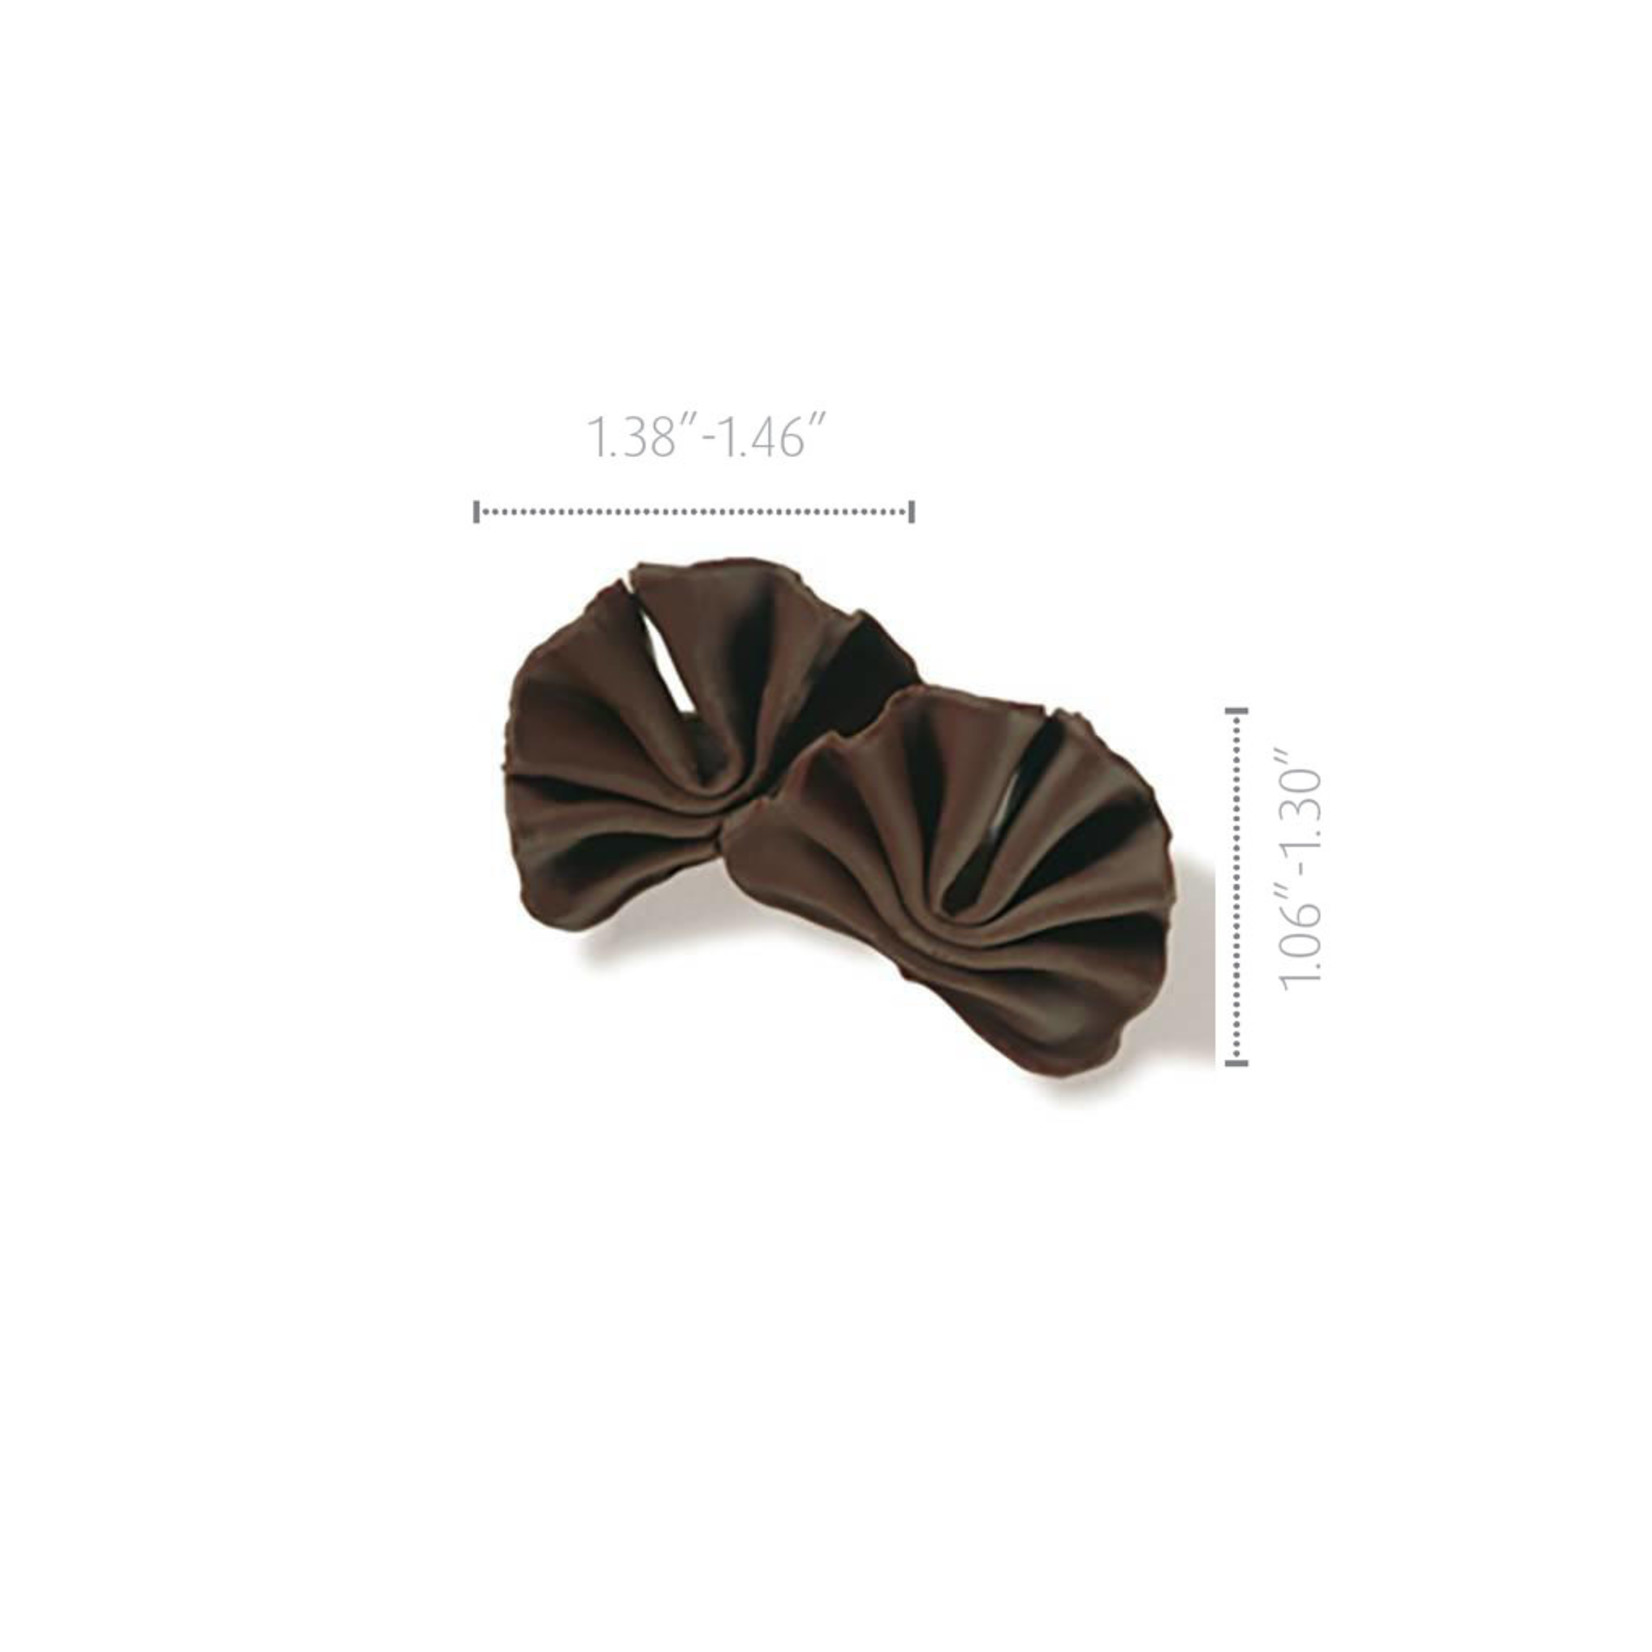 Dobla Dobla - Dark Chocolate Forest Shavings - 1.3'' (2.2lb), 71179